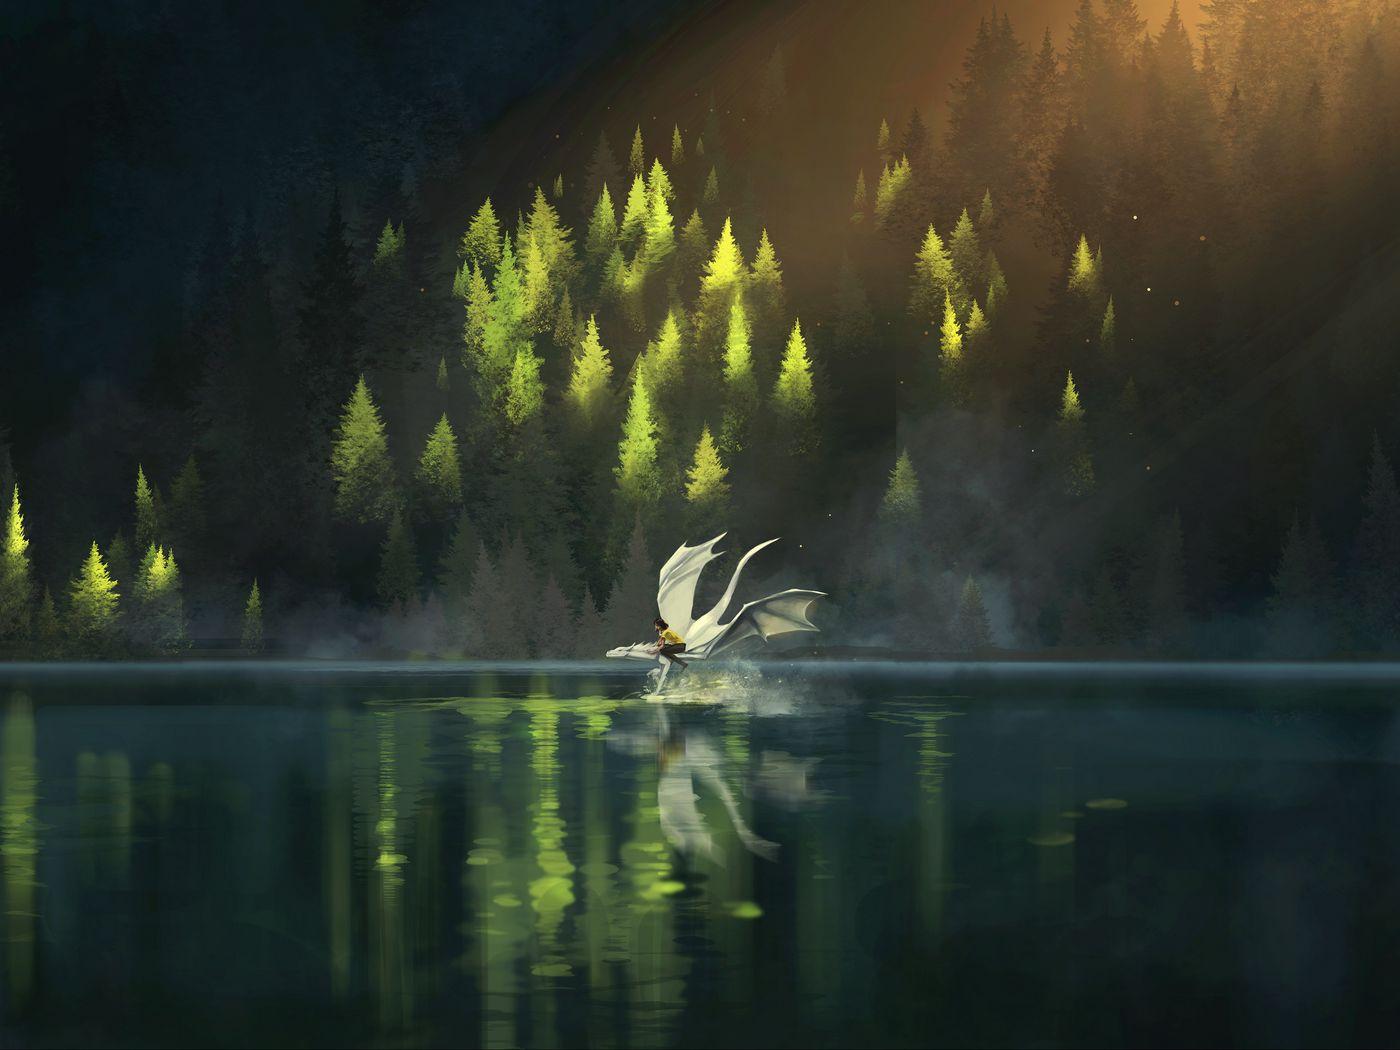 1400x1050 Wallpaper dragon, friends, fantasy, art